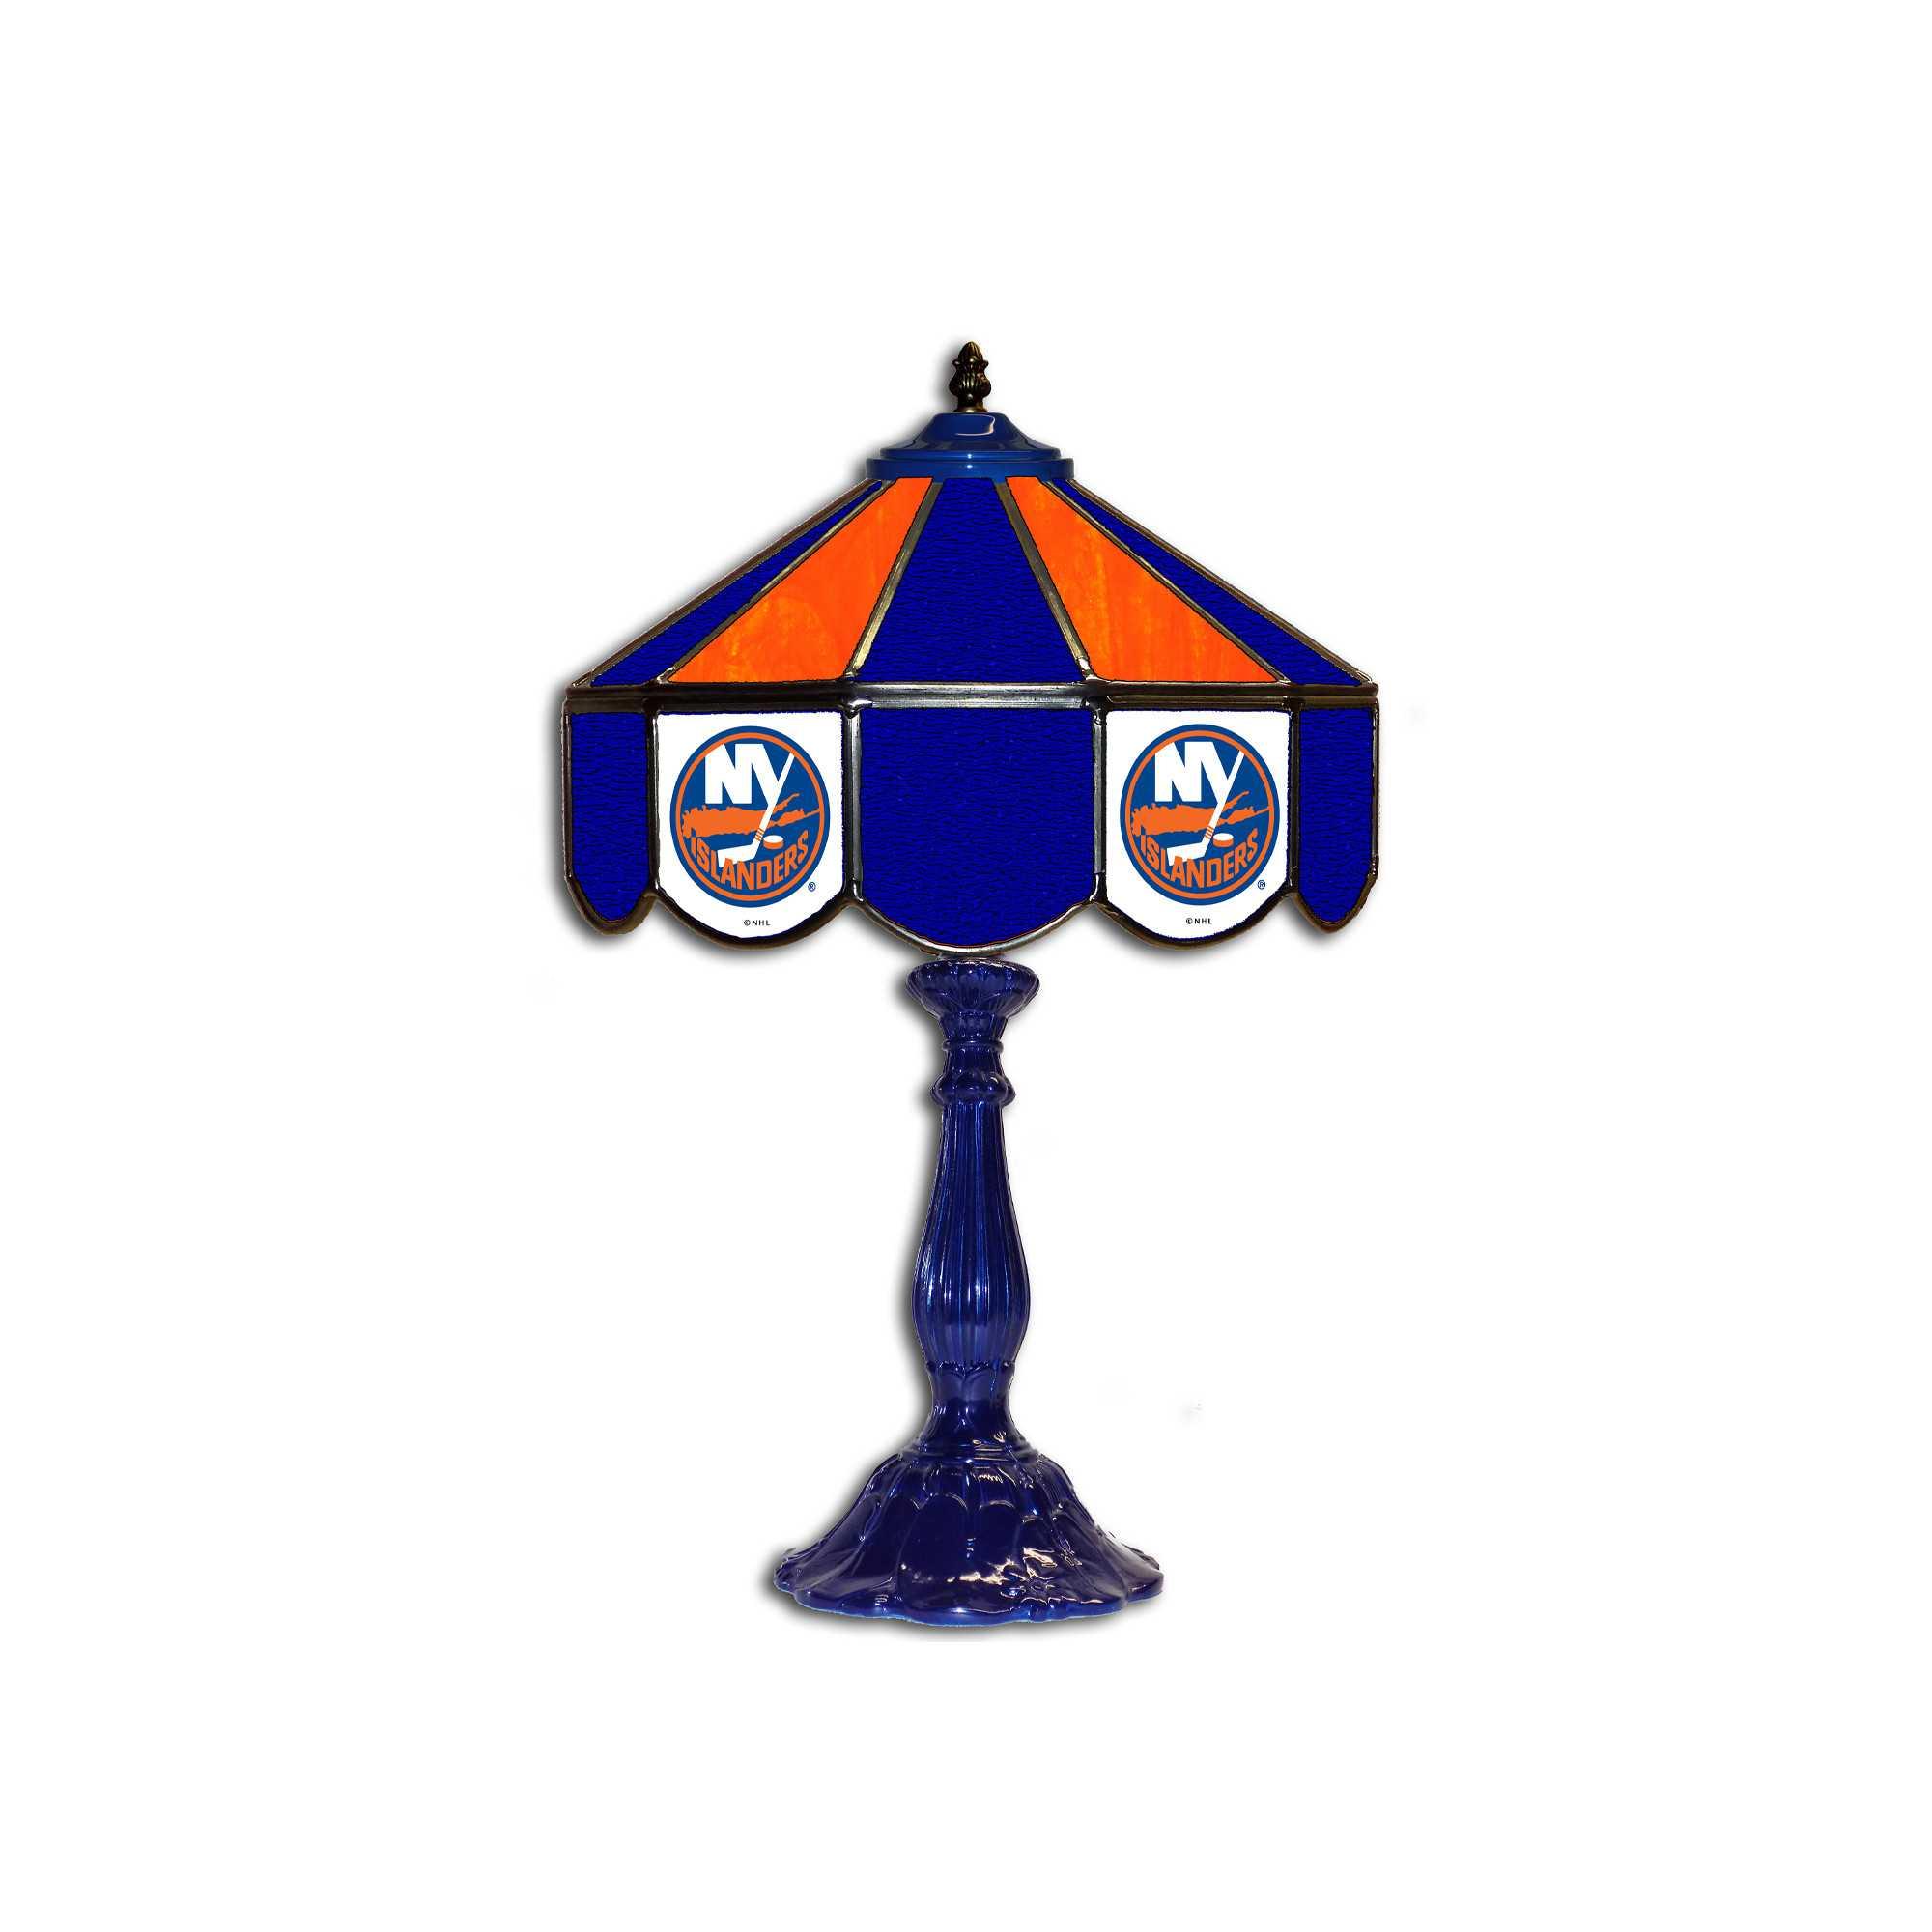 "NEW YORK ISLANDERS 21"" GLASS TABLE LAMP"